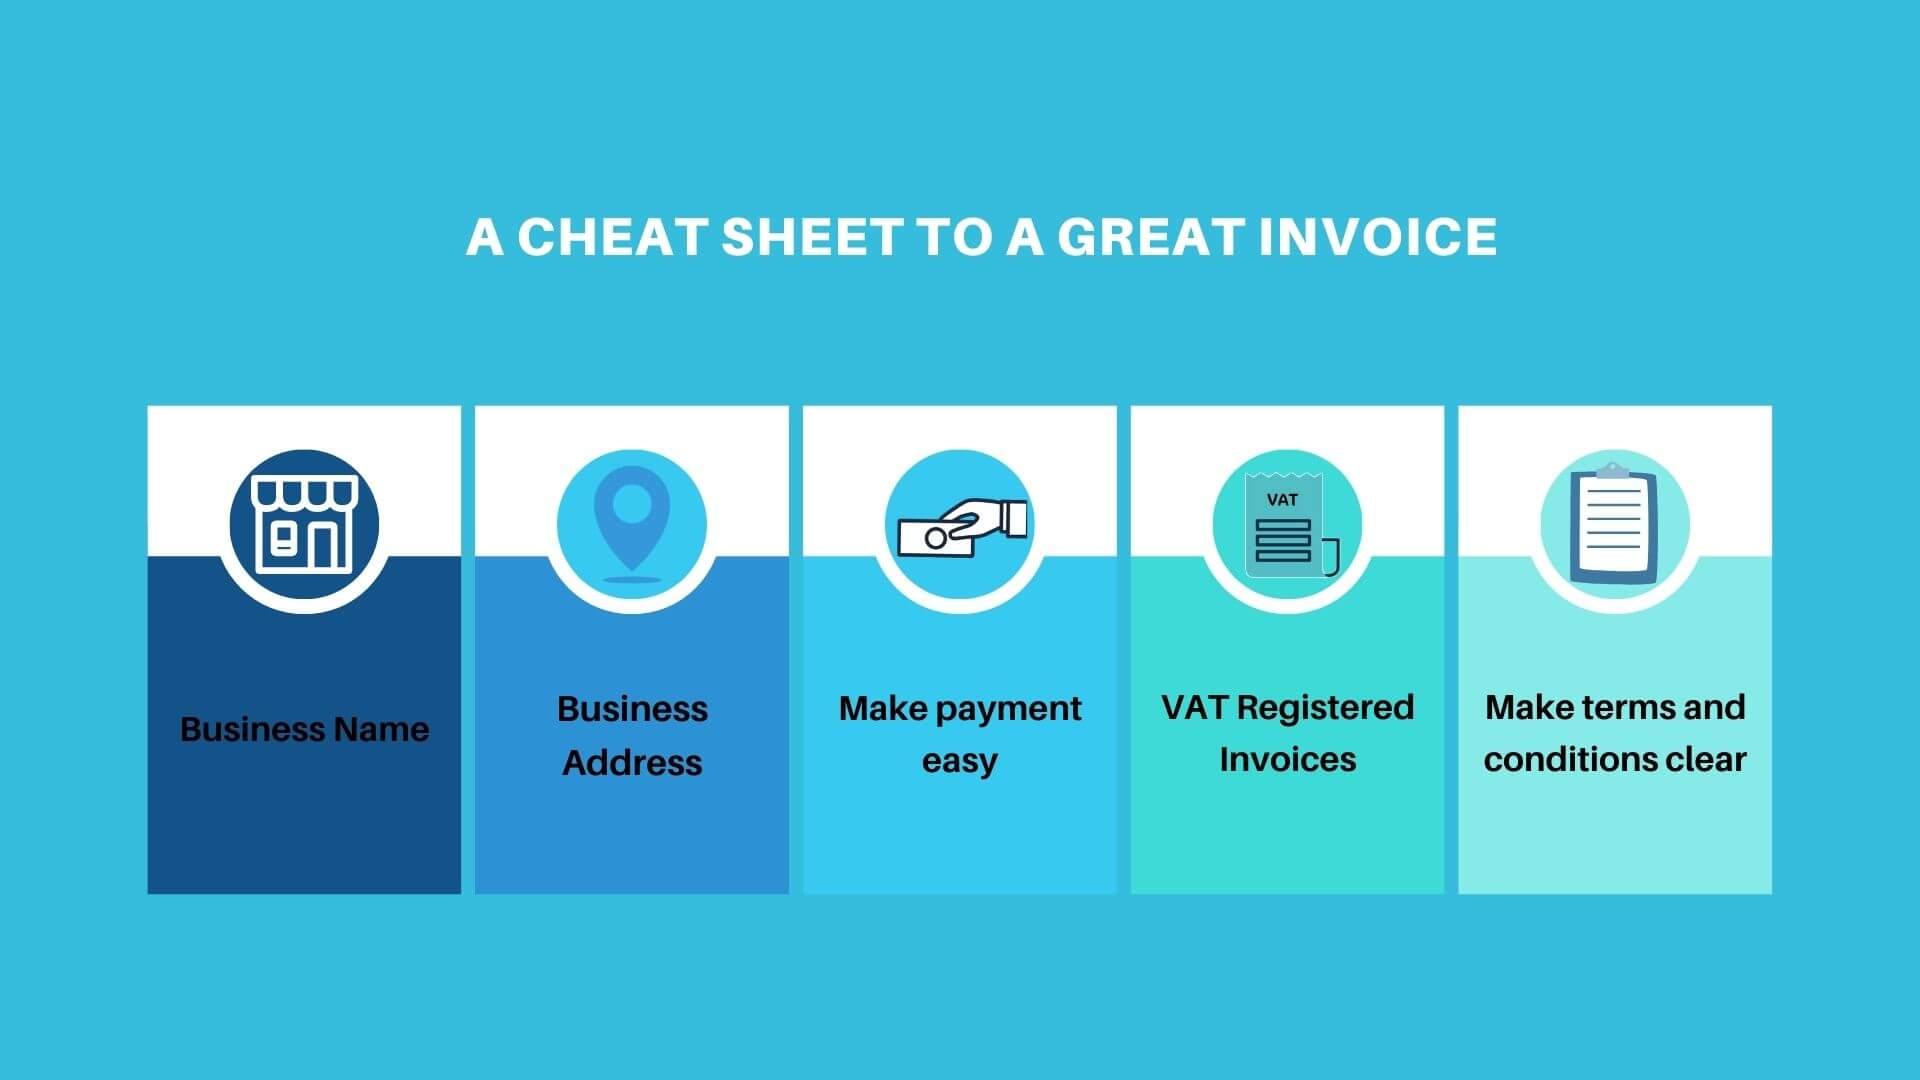 Invoice-Cheat-Sheet